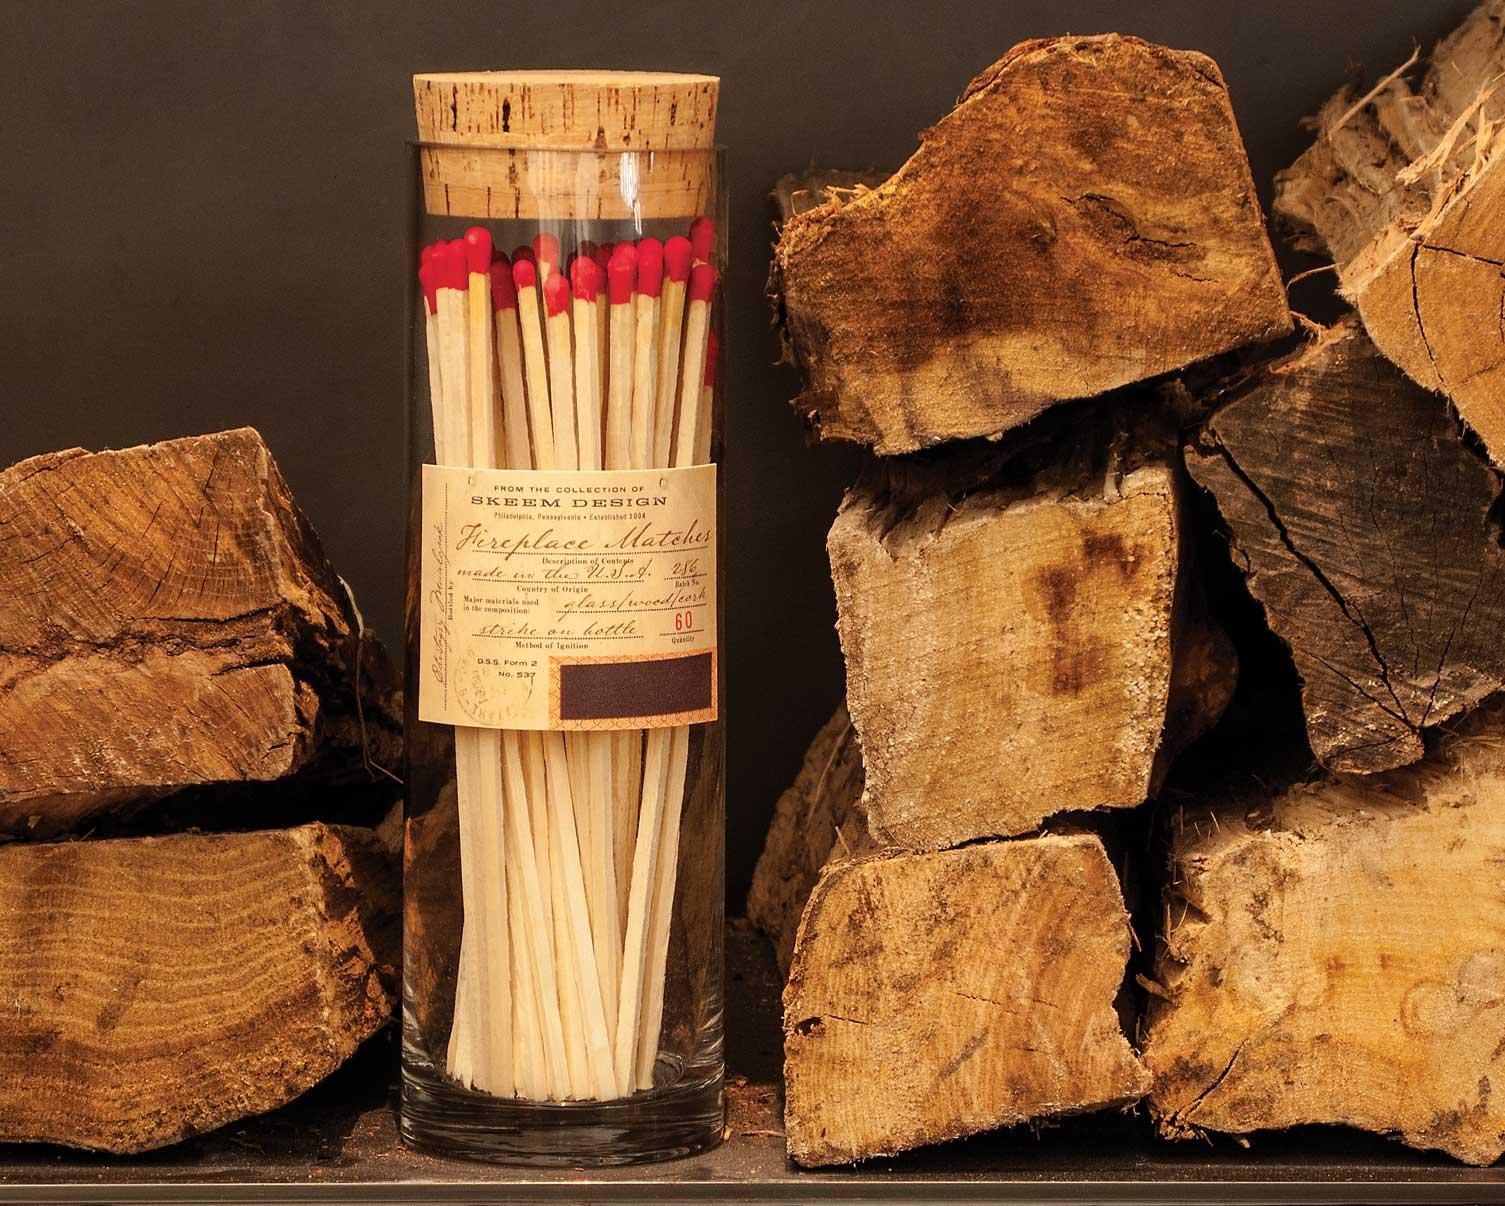 home.fireplace.matches.jpg